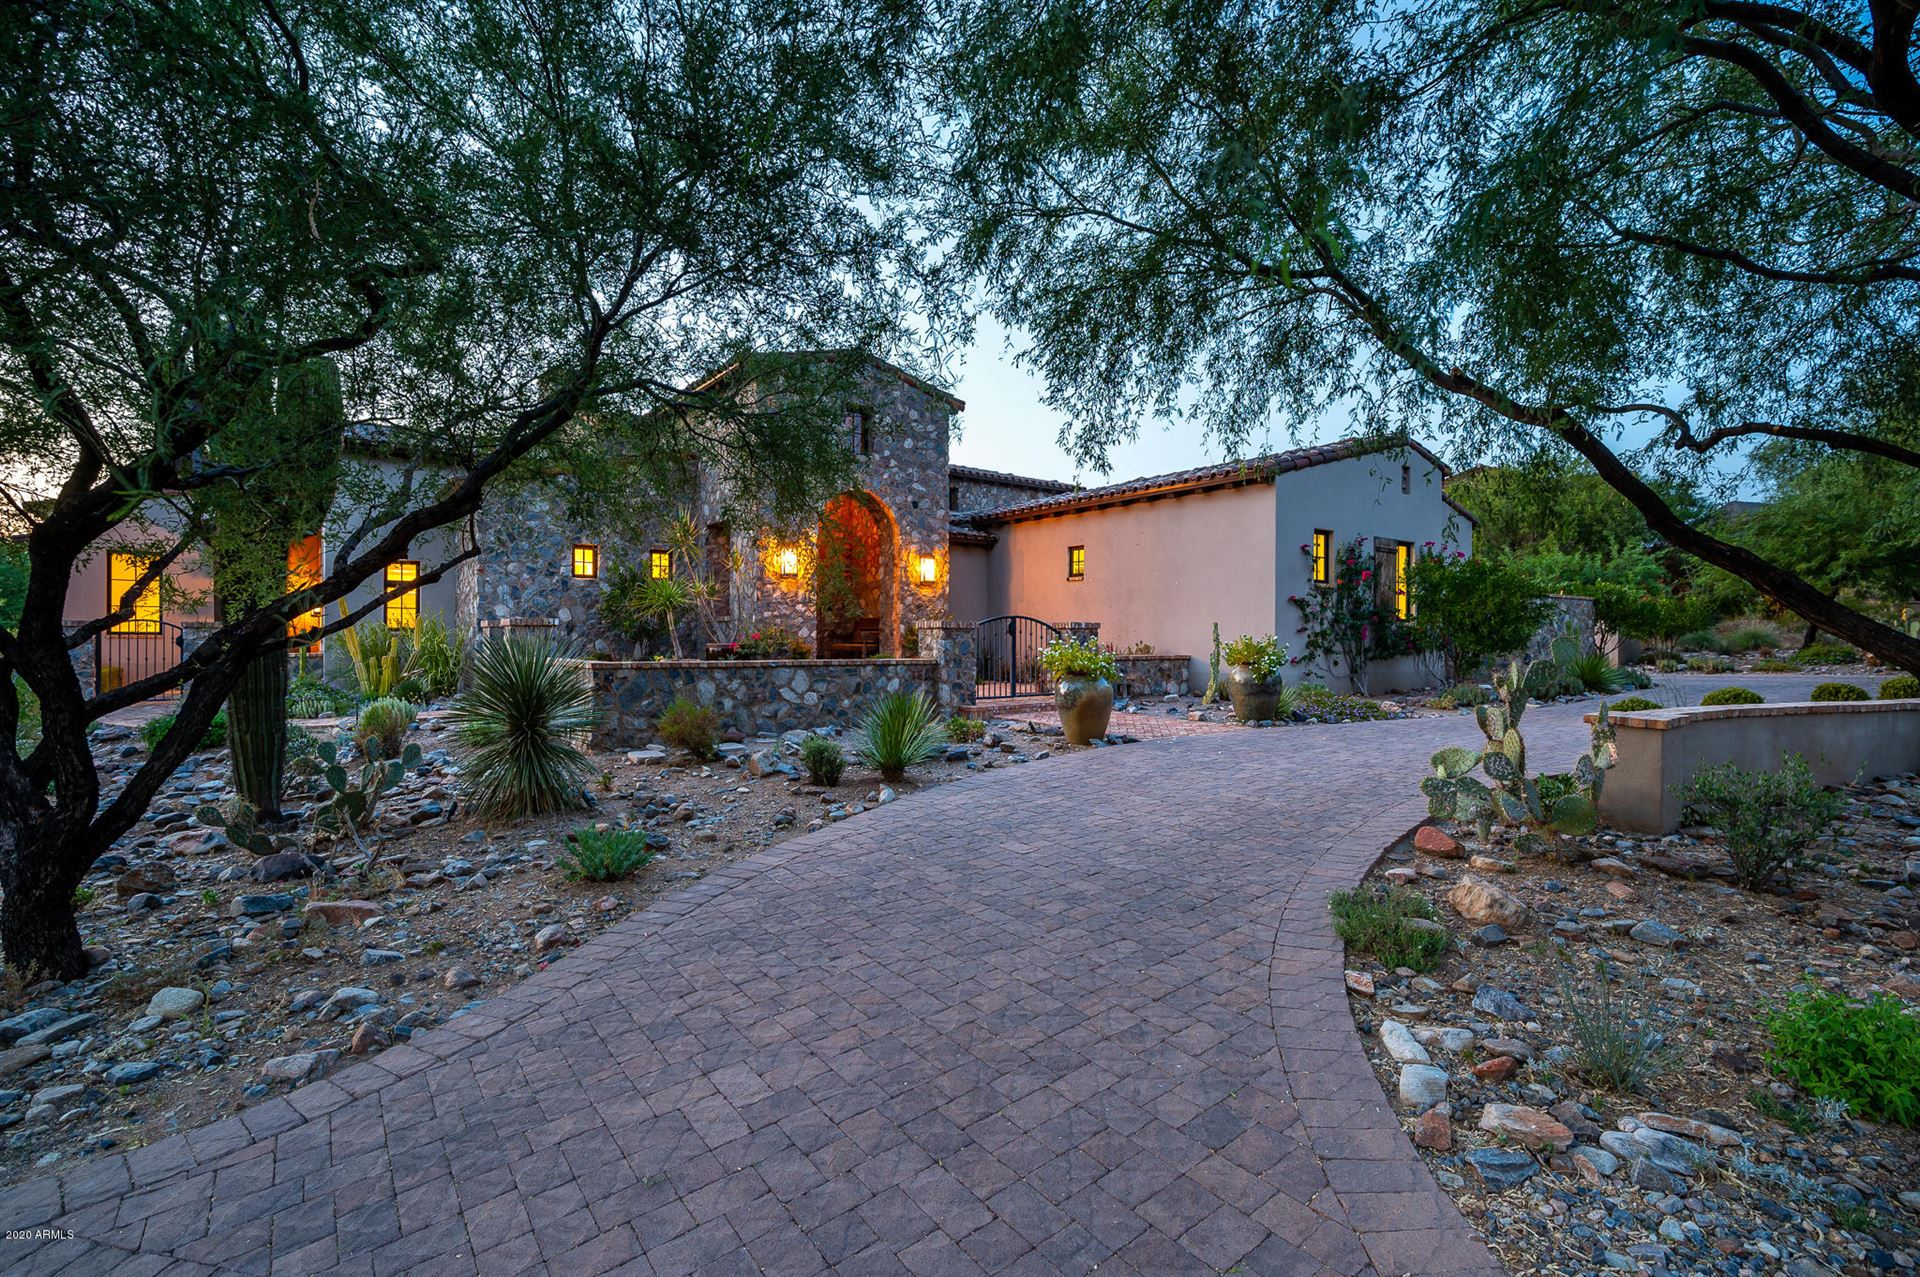 Photo of 10114 E HUALAPAI Drive, Scottsdale, AZ 85255 (MLS # 6131729)